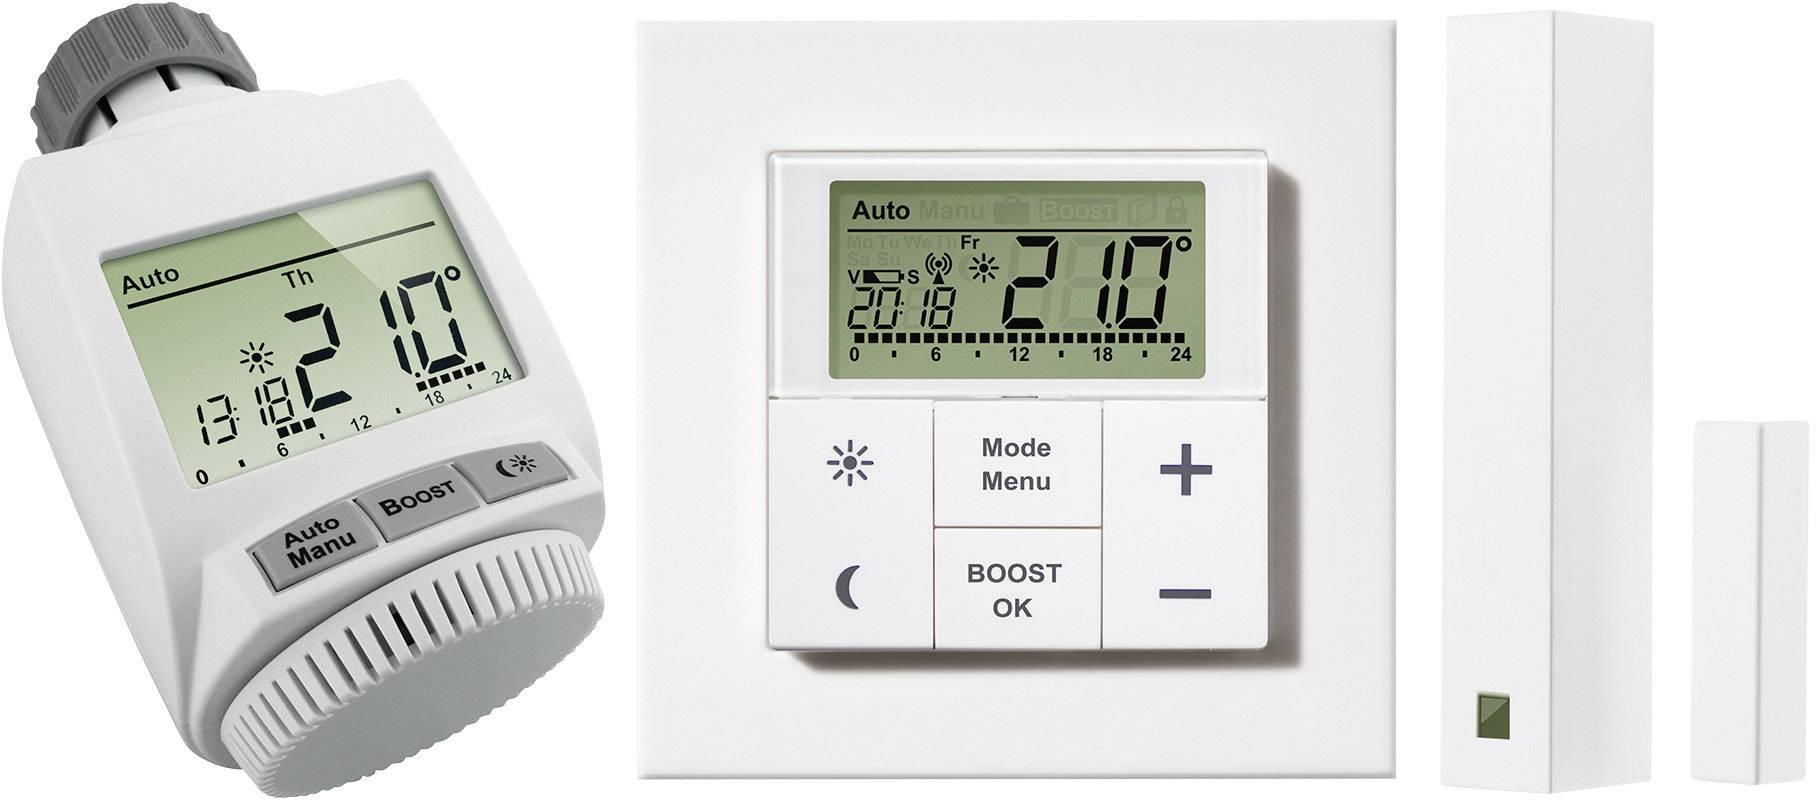 Sada bezdrátového termostatu eQ-3 MAX! + okenní a dveřní kontakt + termostatická hlavice eQ-3 MAX!+